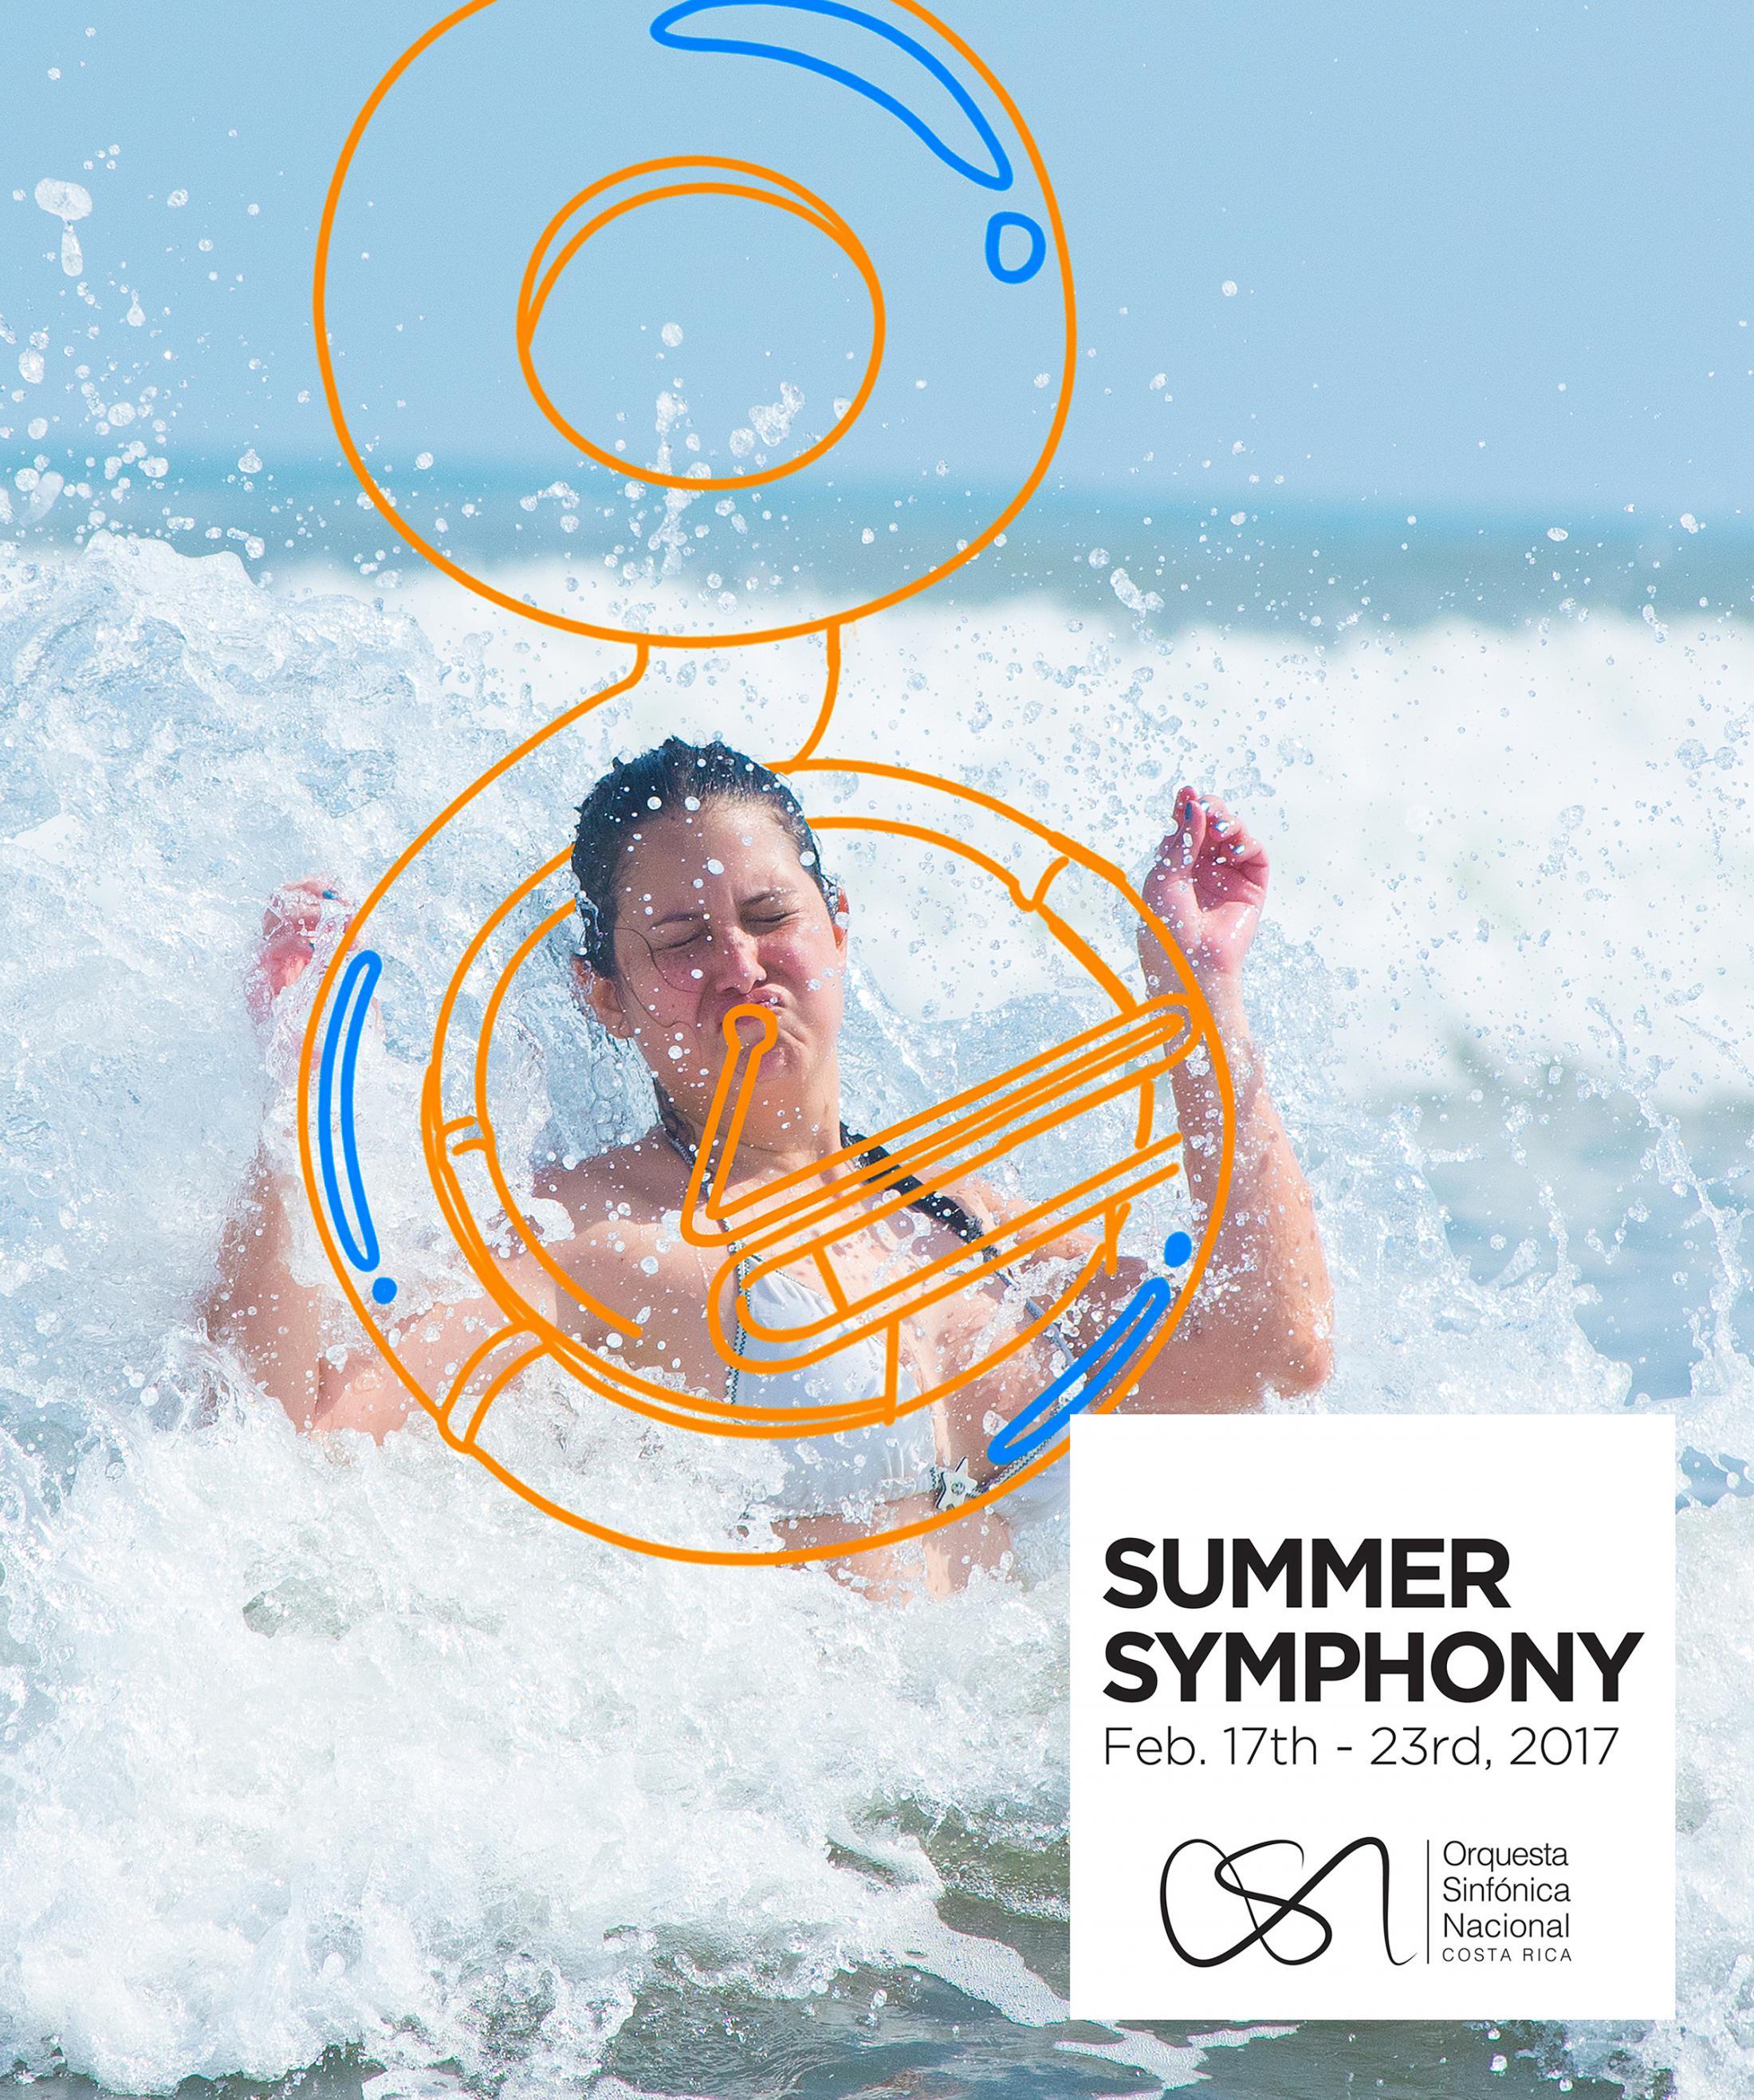 Orquesta Sinfónica Nacional Outdoor Ad - Summer Symphony - Tuba